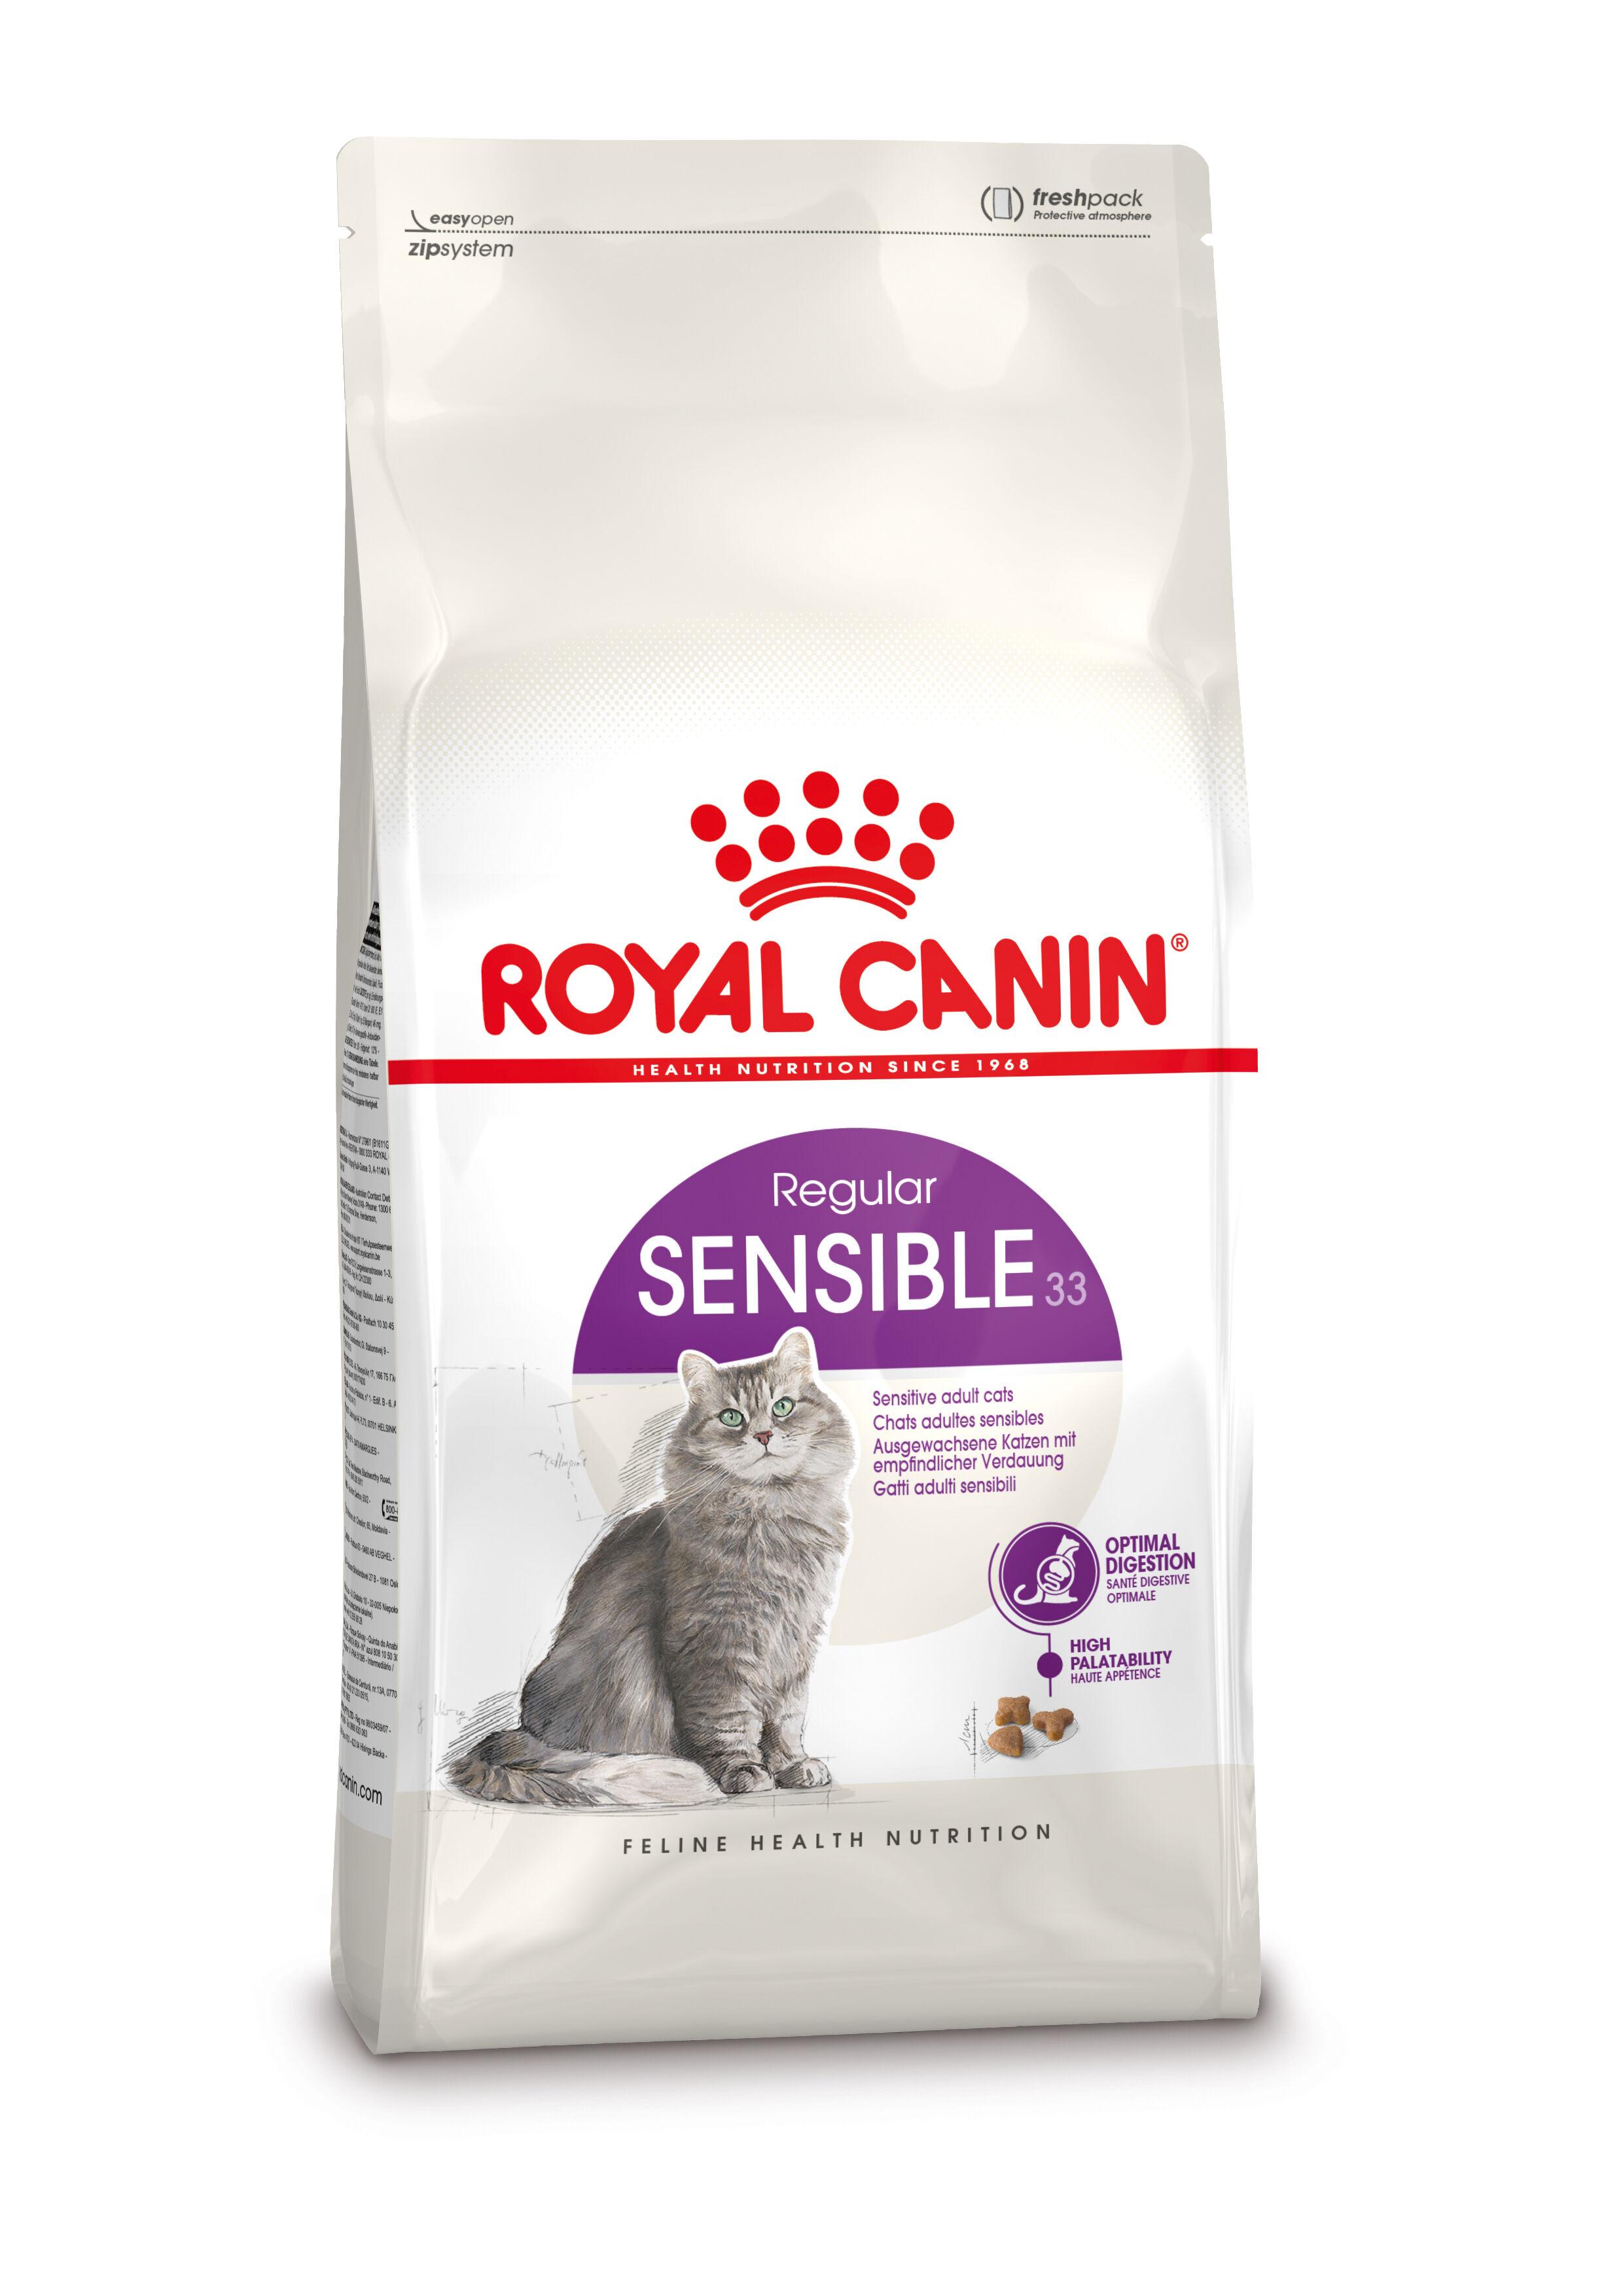 Royal Canin Chat Sensible 33 2 x 10 kg